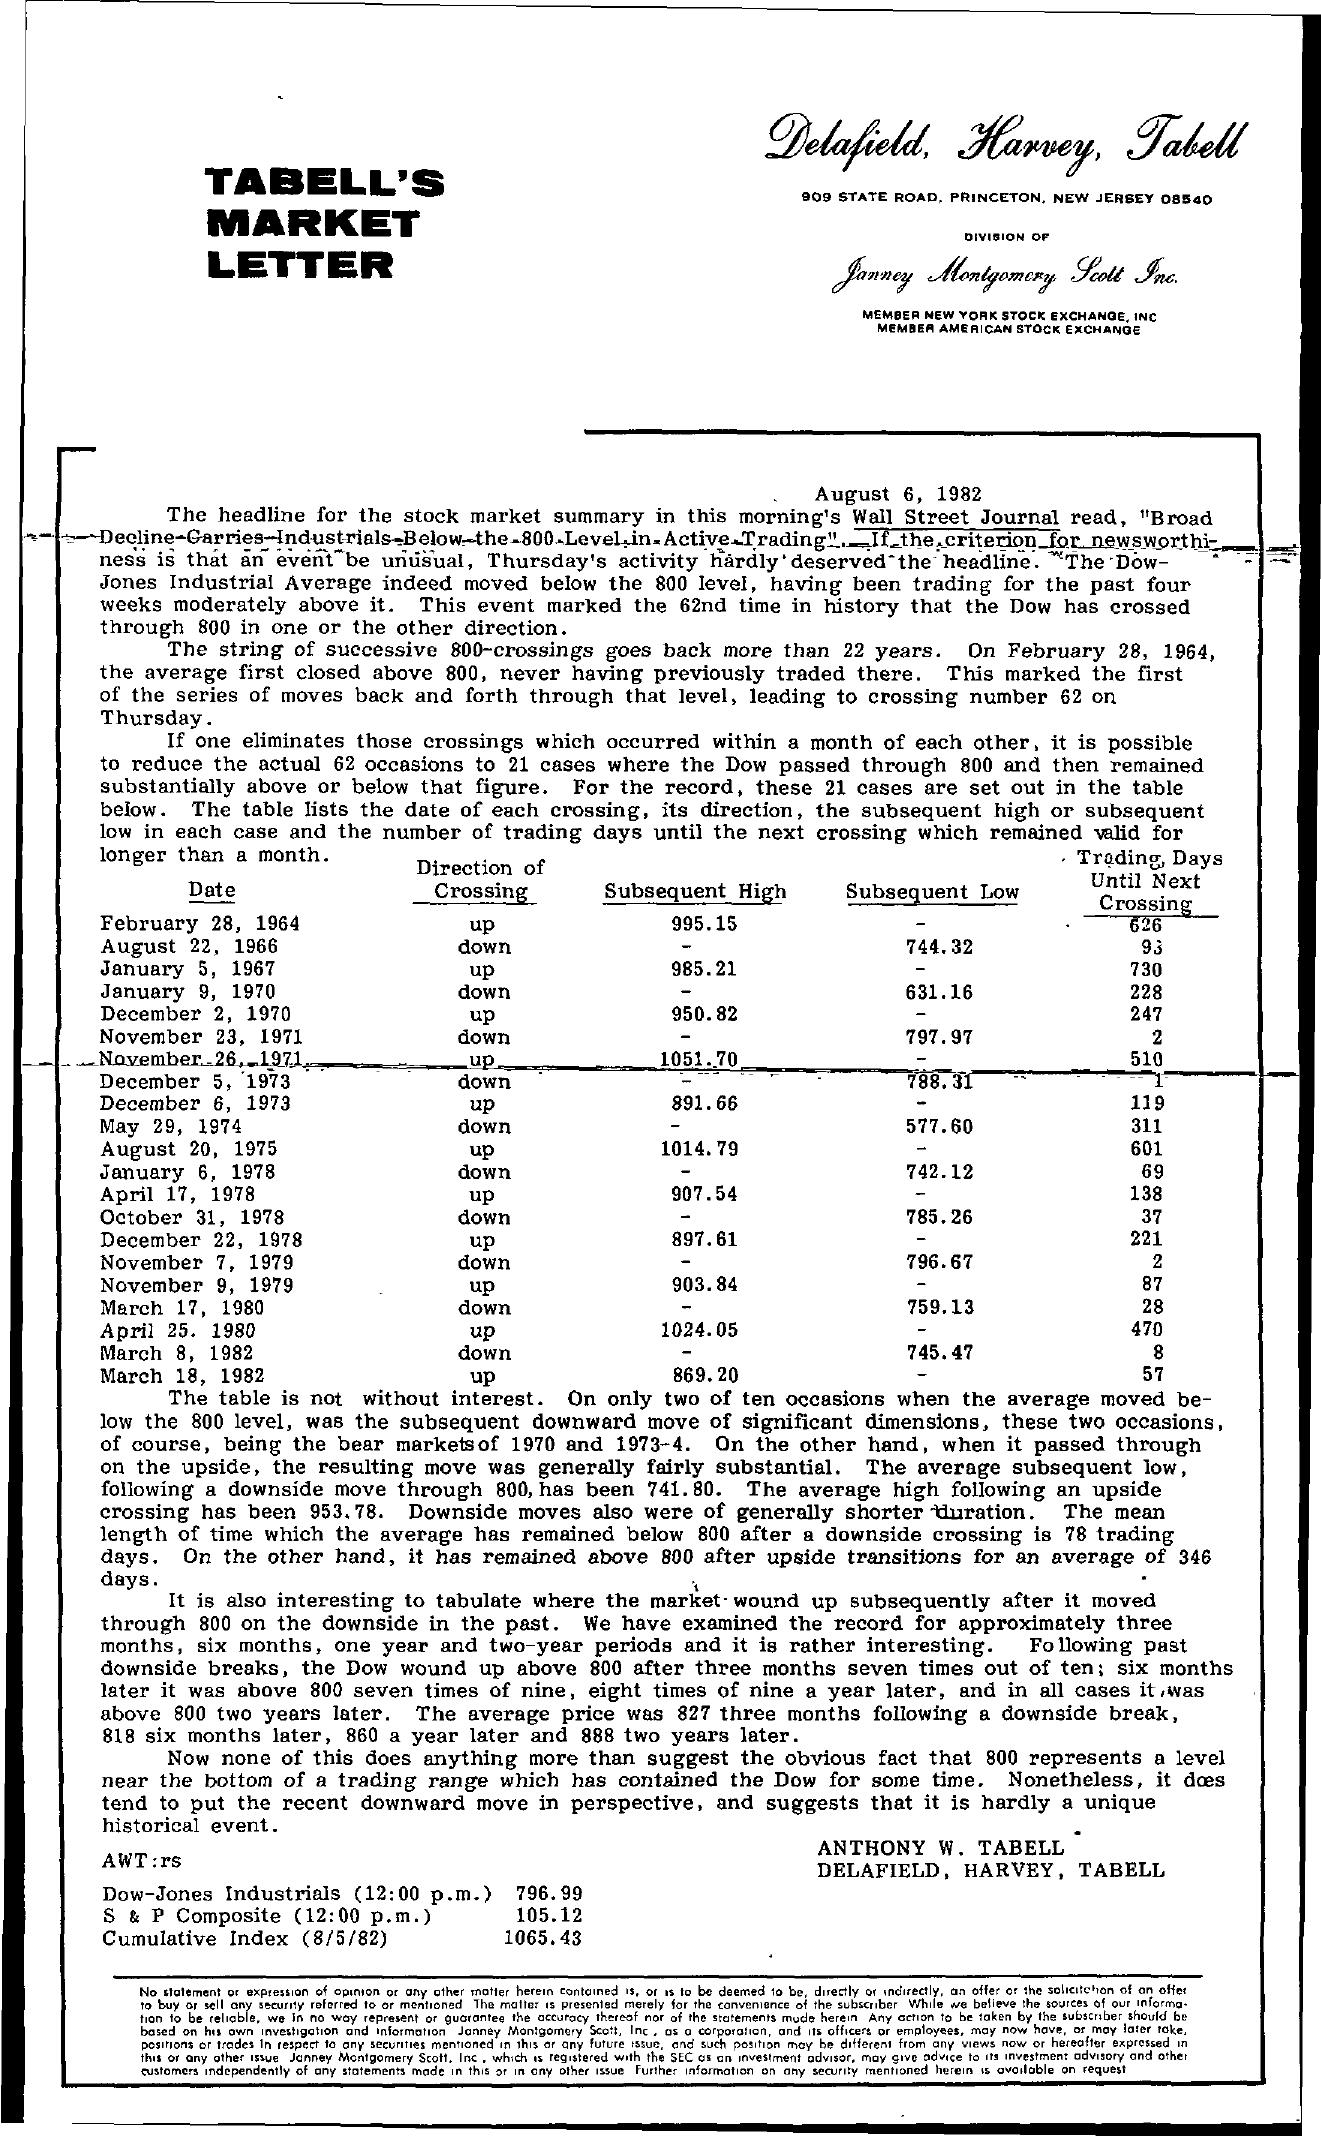 Tabell's Market Letter - August 06, 1982